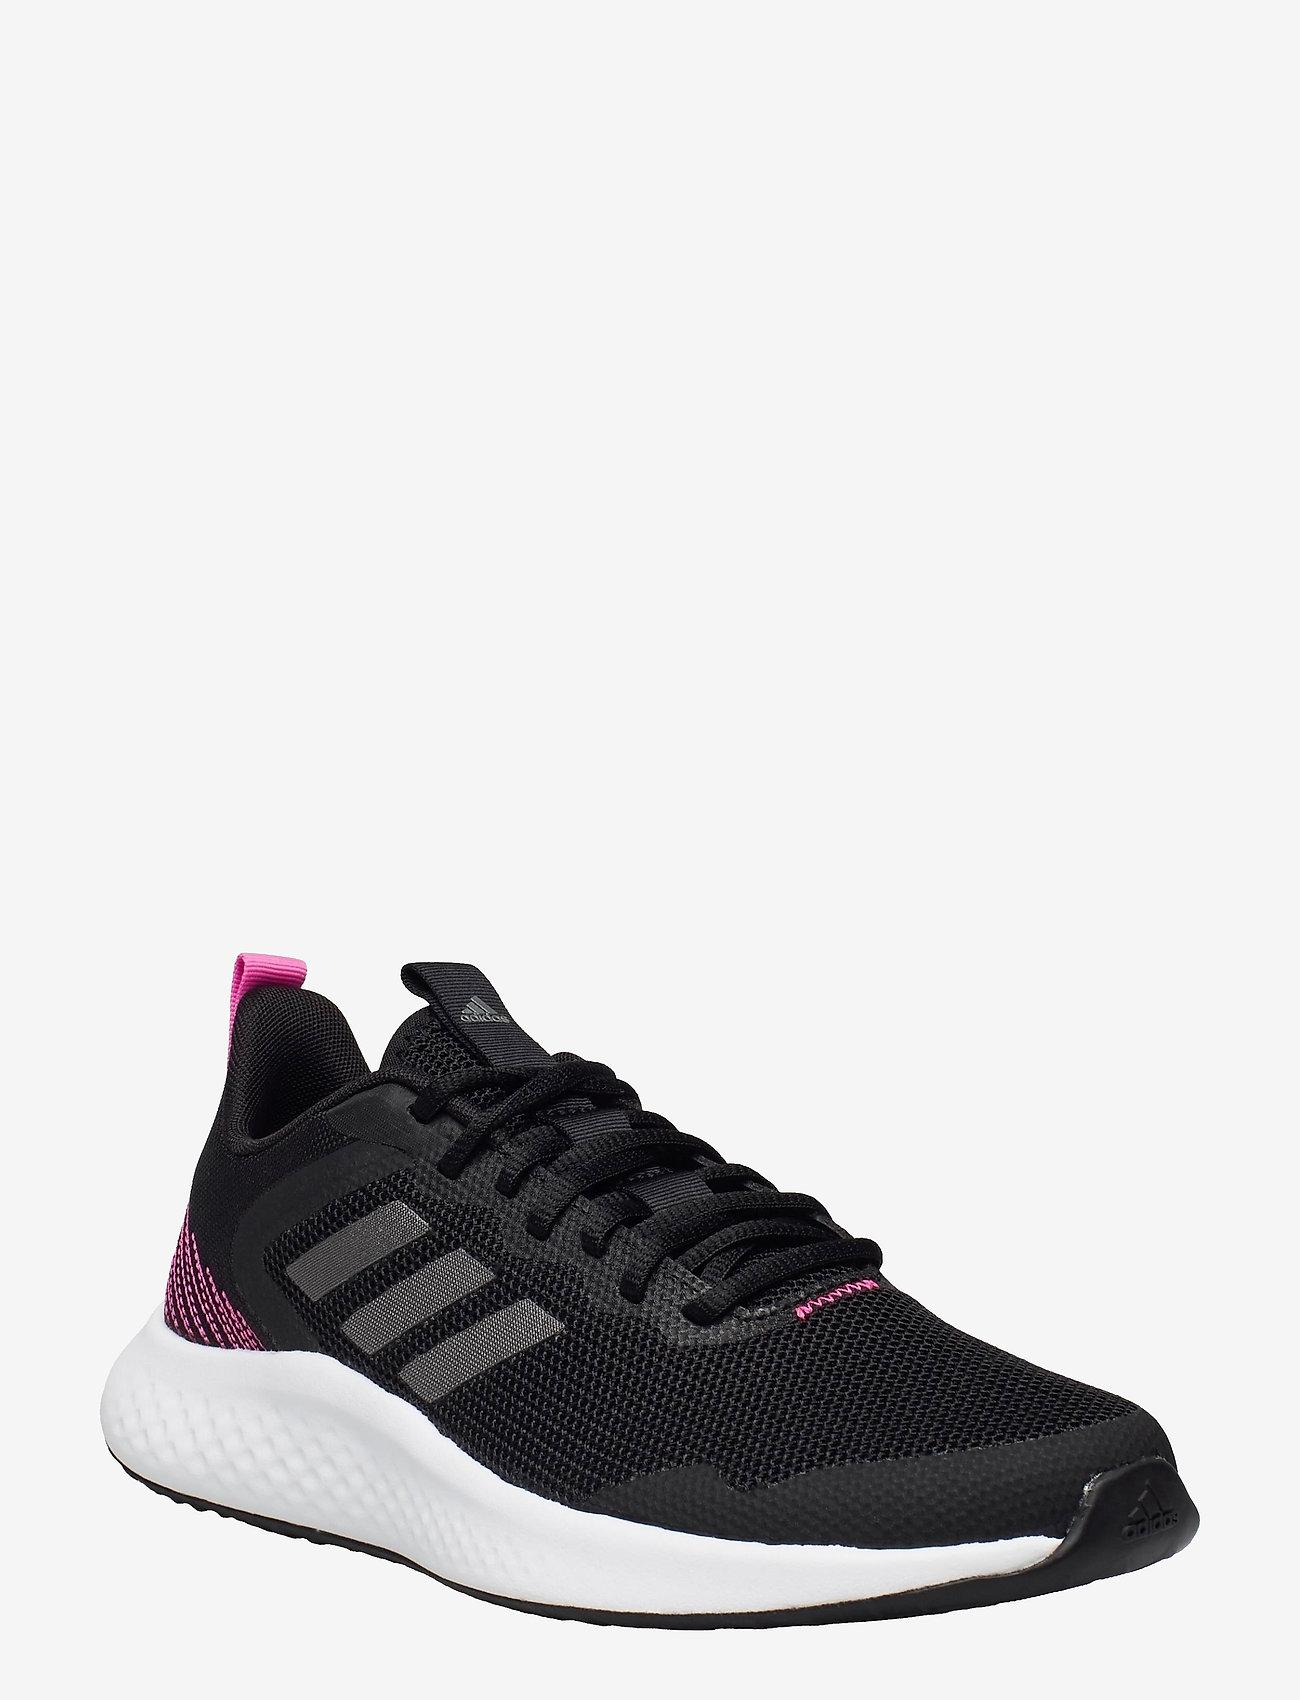 adidas Performance - Fluidstreet  W - running shoes - cblack/ironmt/scrpnk - 0